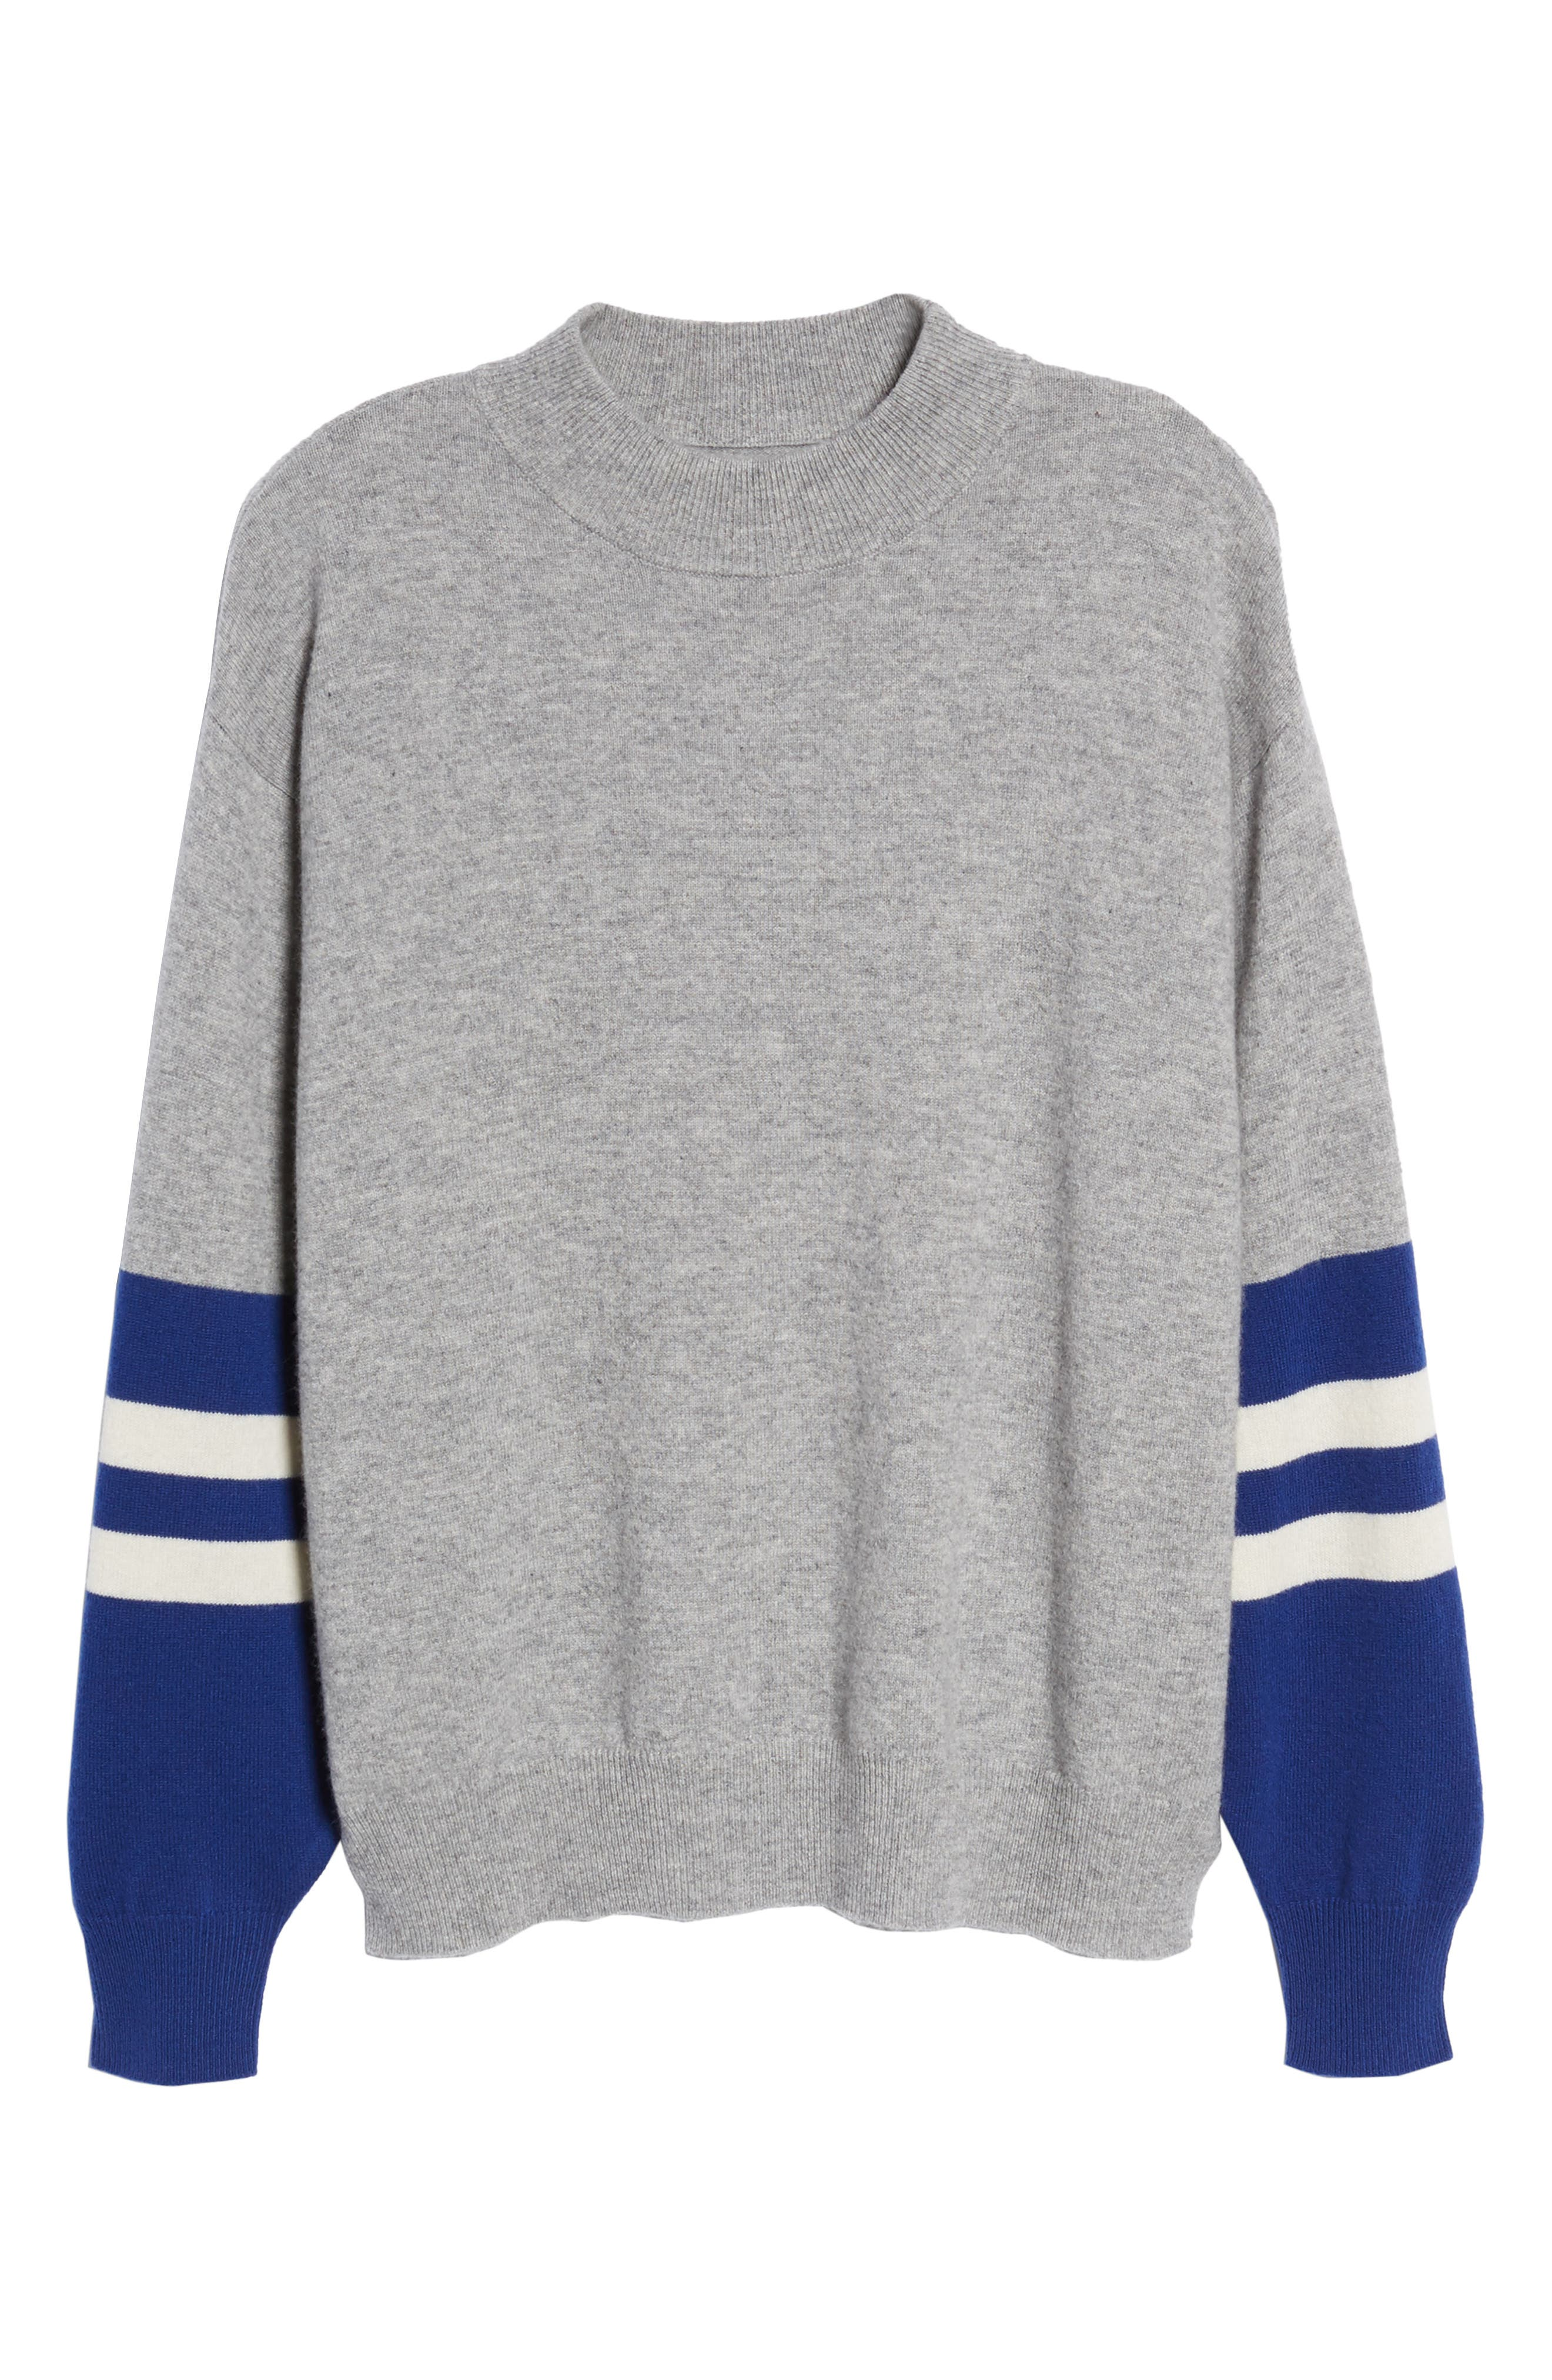 Colorblock Cashmere Sweater,                             Alternate thumbnail 6, color,                             HEATHER GREY